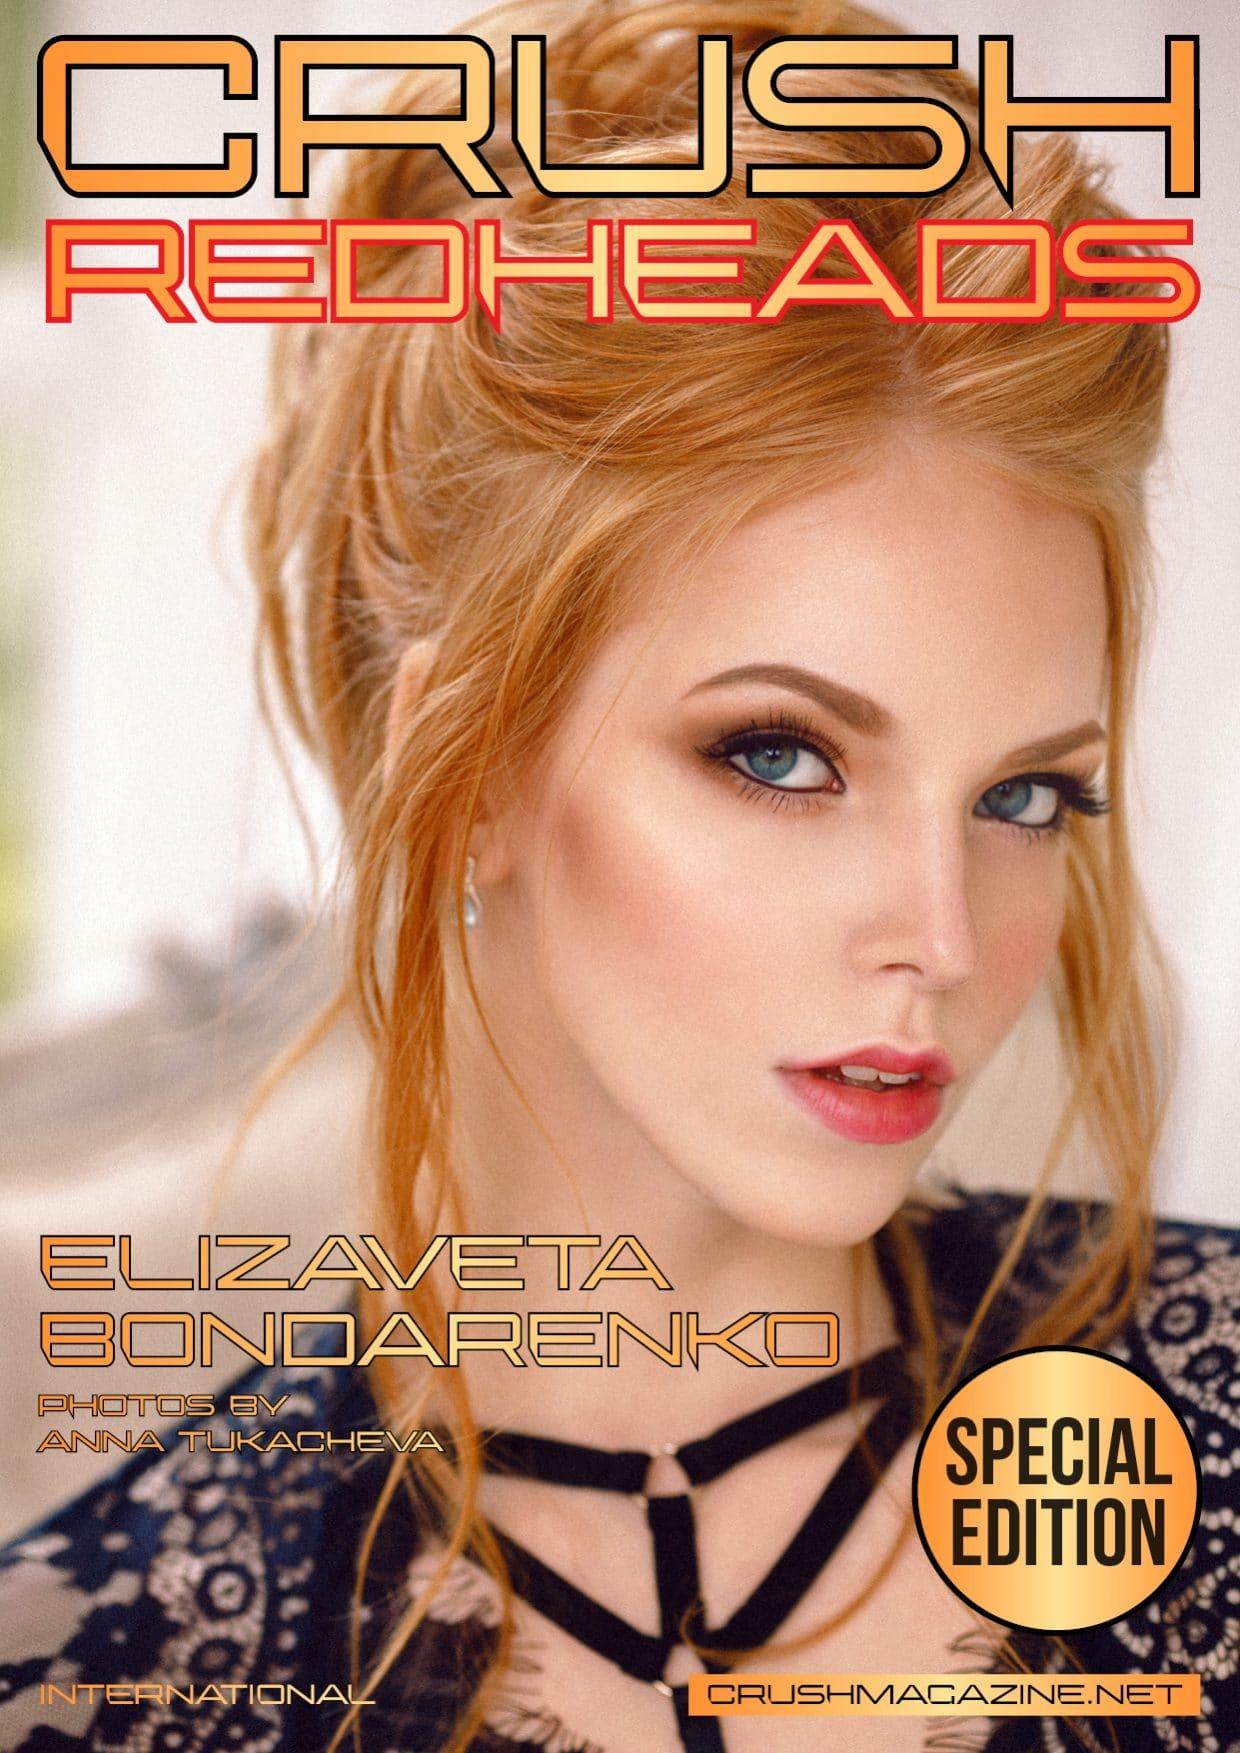 Crush Magazine - Redheads - Elizaveta Bondarenko 1